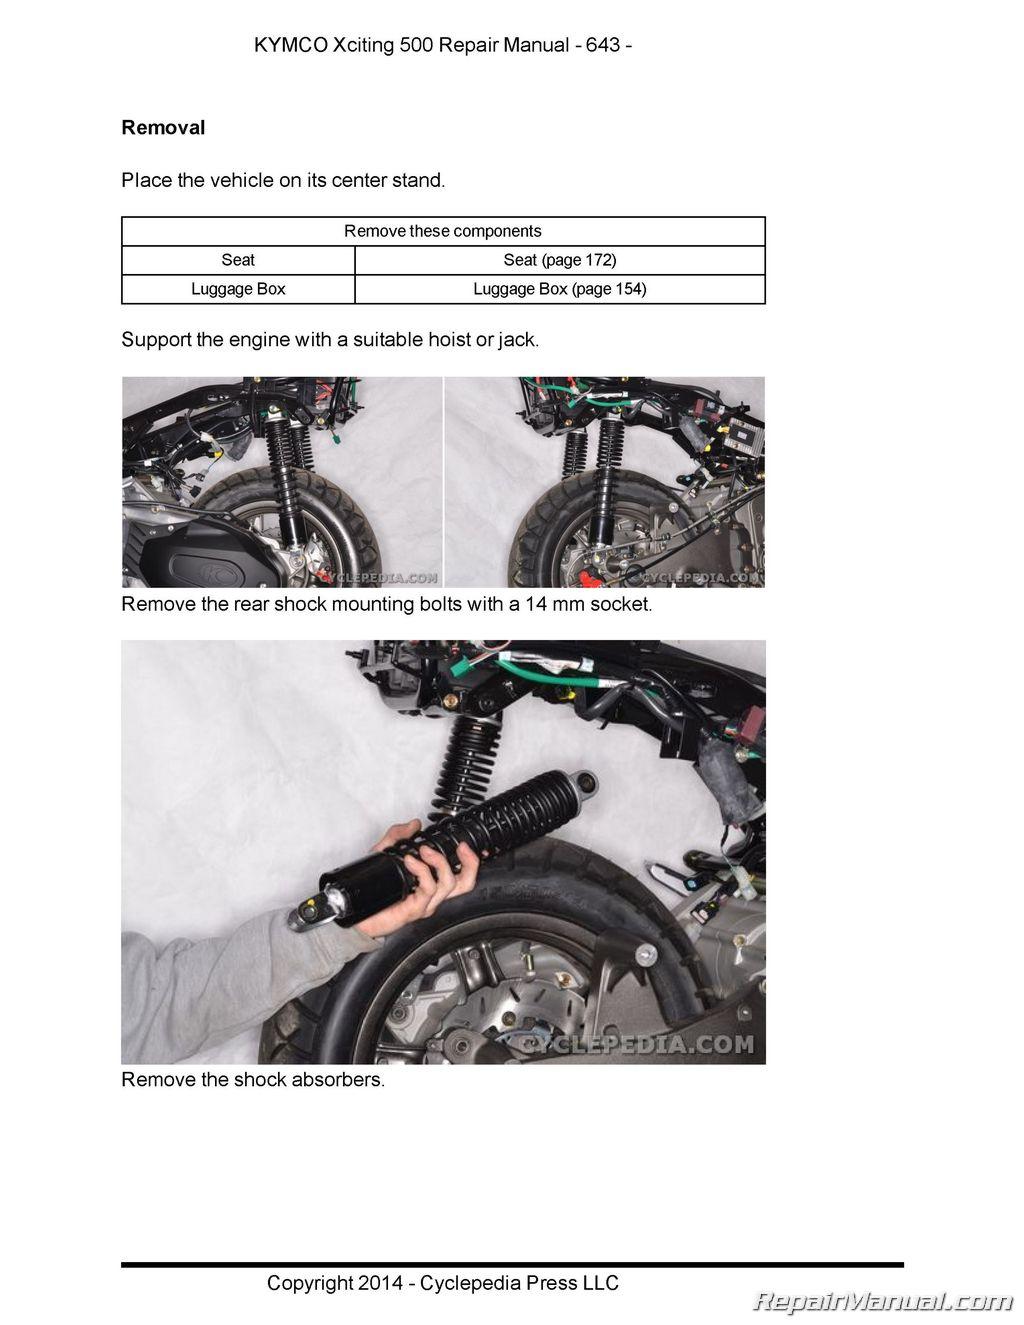 Kymco Xciting 500 Service Repair Manual